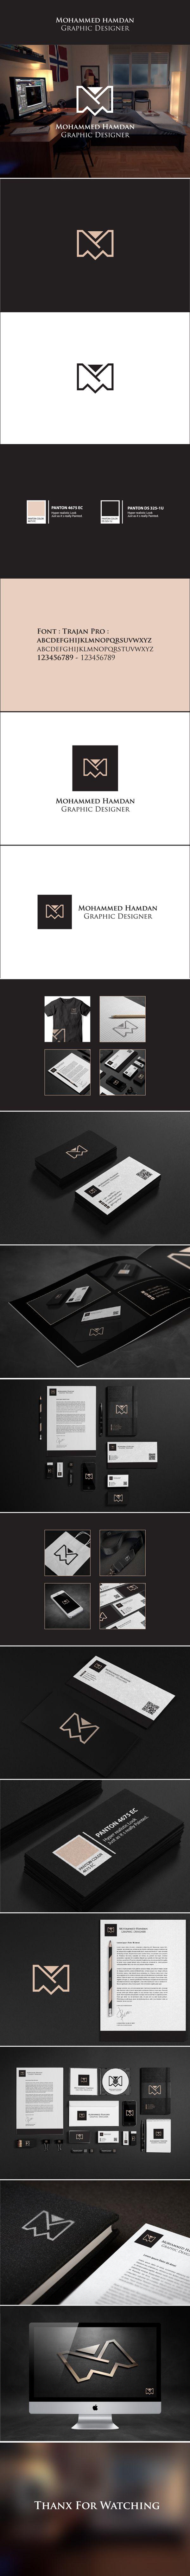 Personal Identity & Personal logo by mohammed hamdan, via Behance | #stationary #corporate #design #corporatedesign #identity #branding #marketing < repinned by www.BlickeDeeler.de | Take a look at www.LogoGestaltung-Hamburg.de